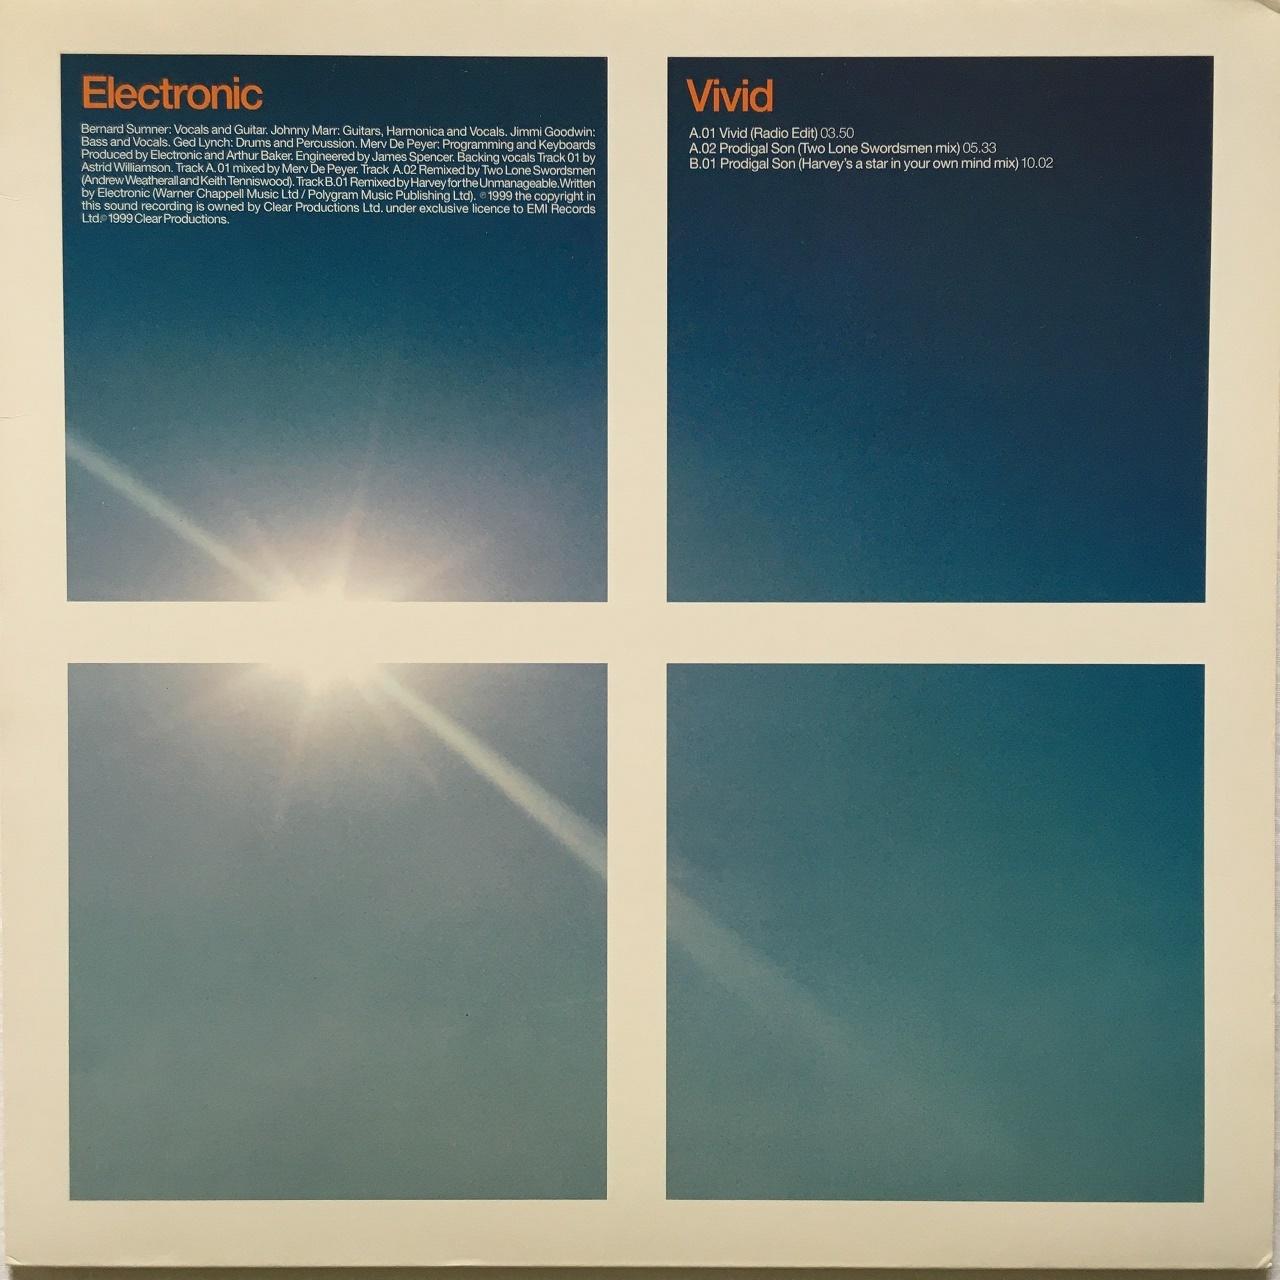 【12inch・欧州盤】Electronic / Vivid